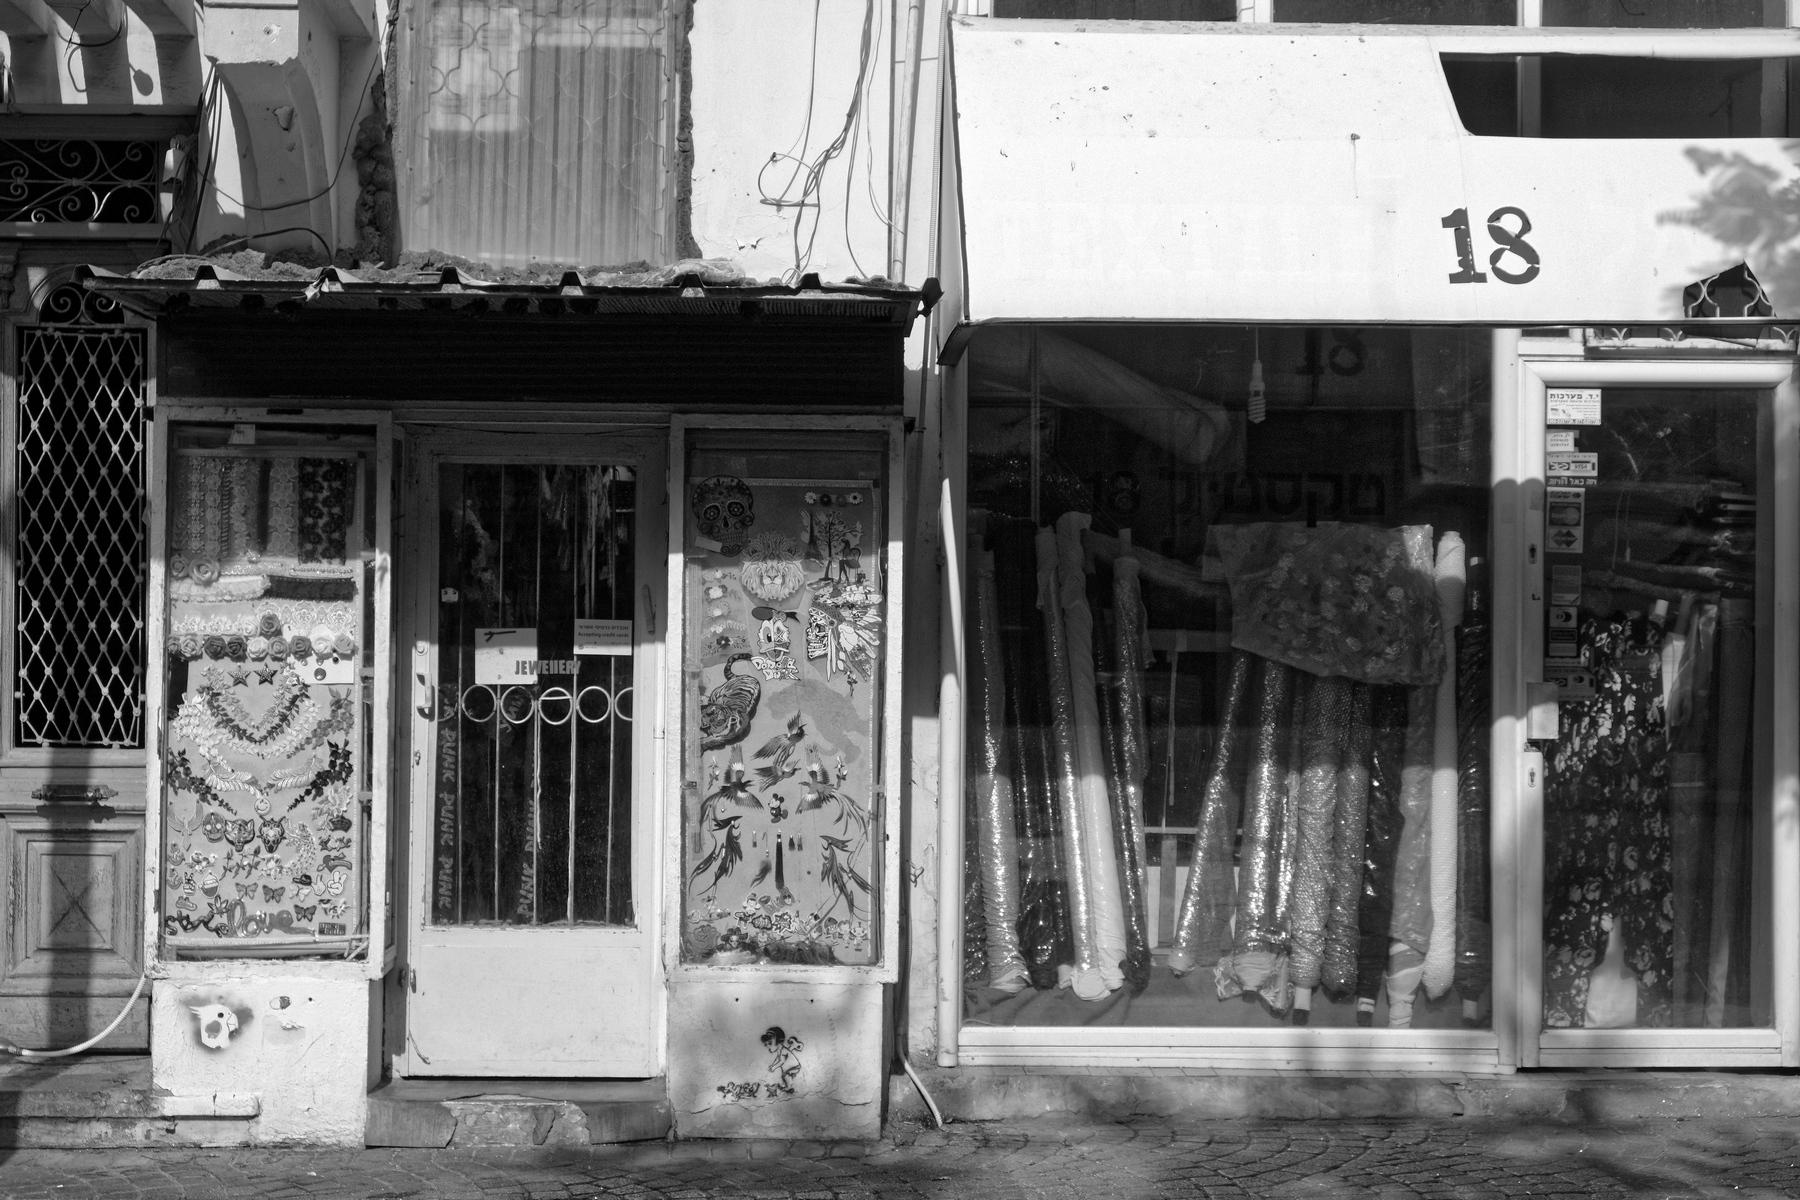 Haim_Blumenblat_Shopping Windows_Fabric Place_6.jpg